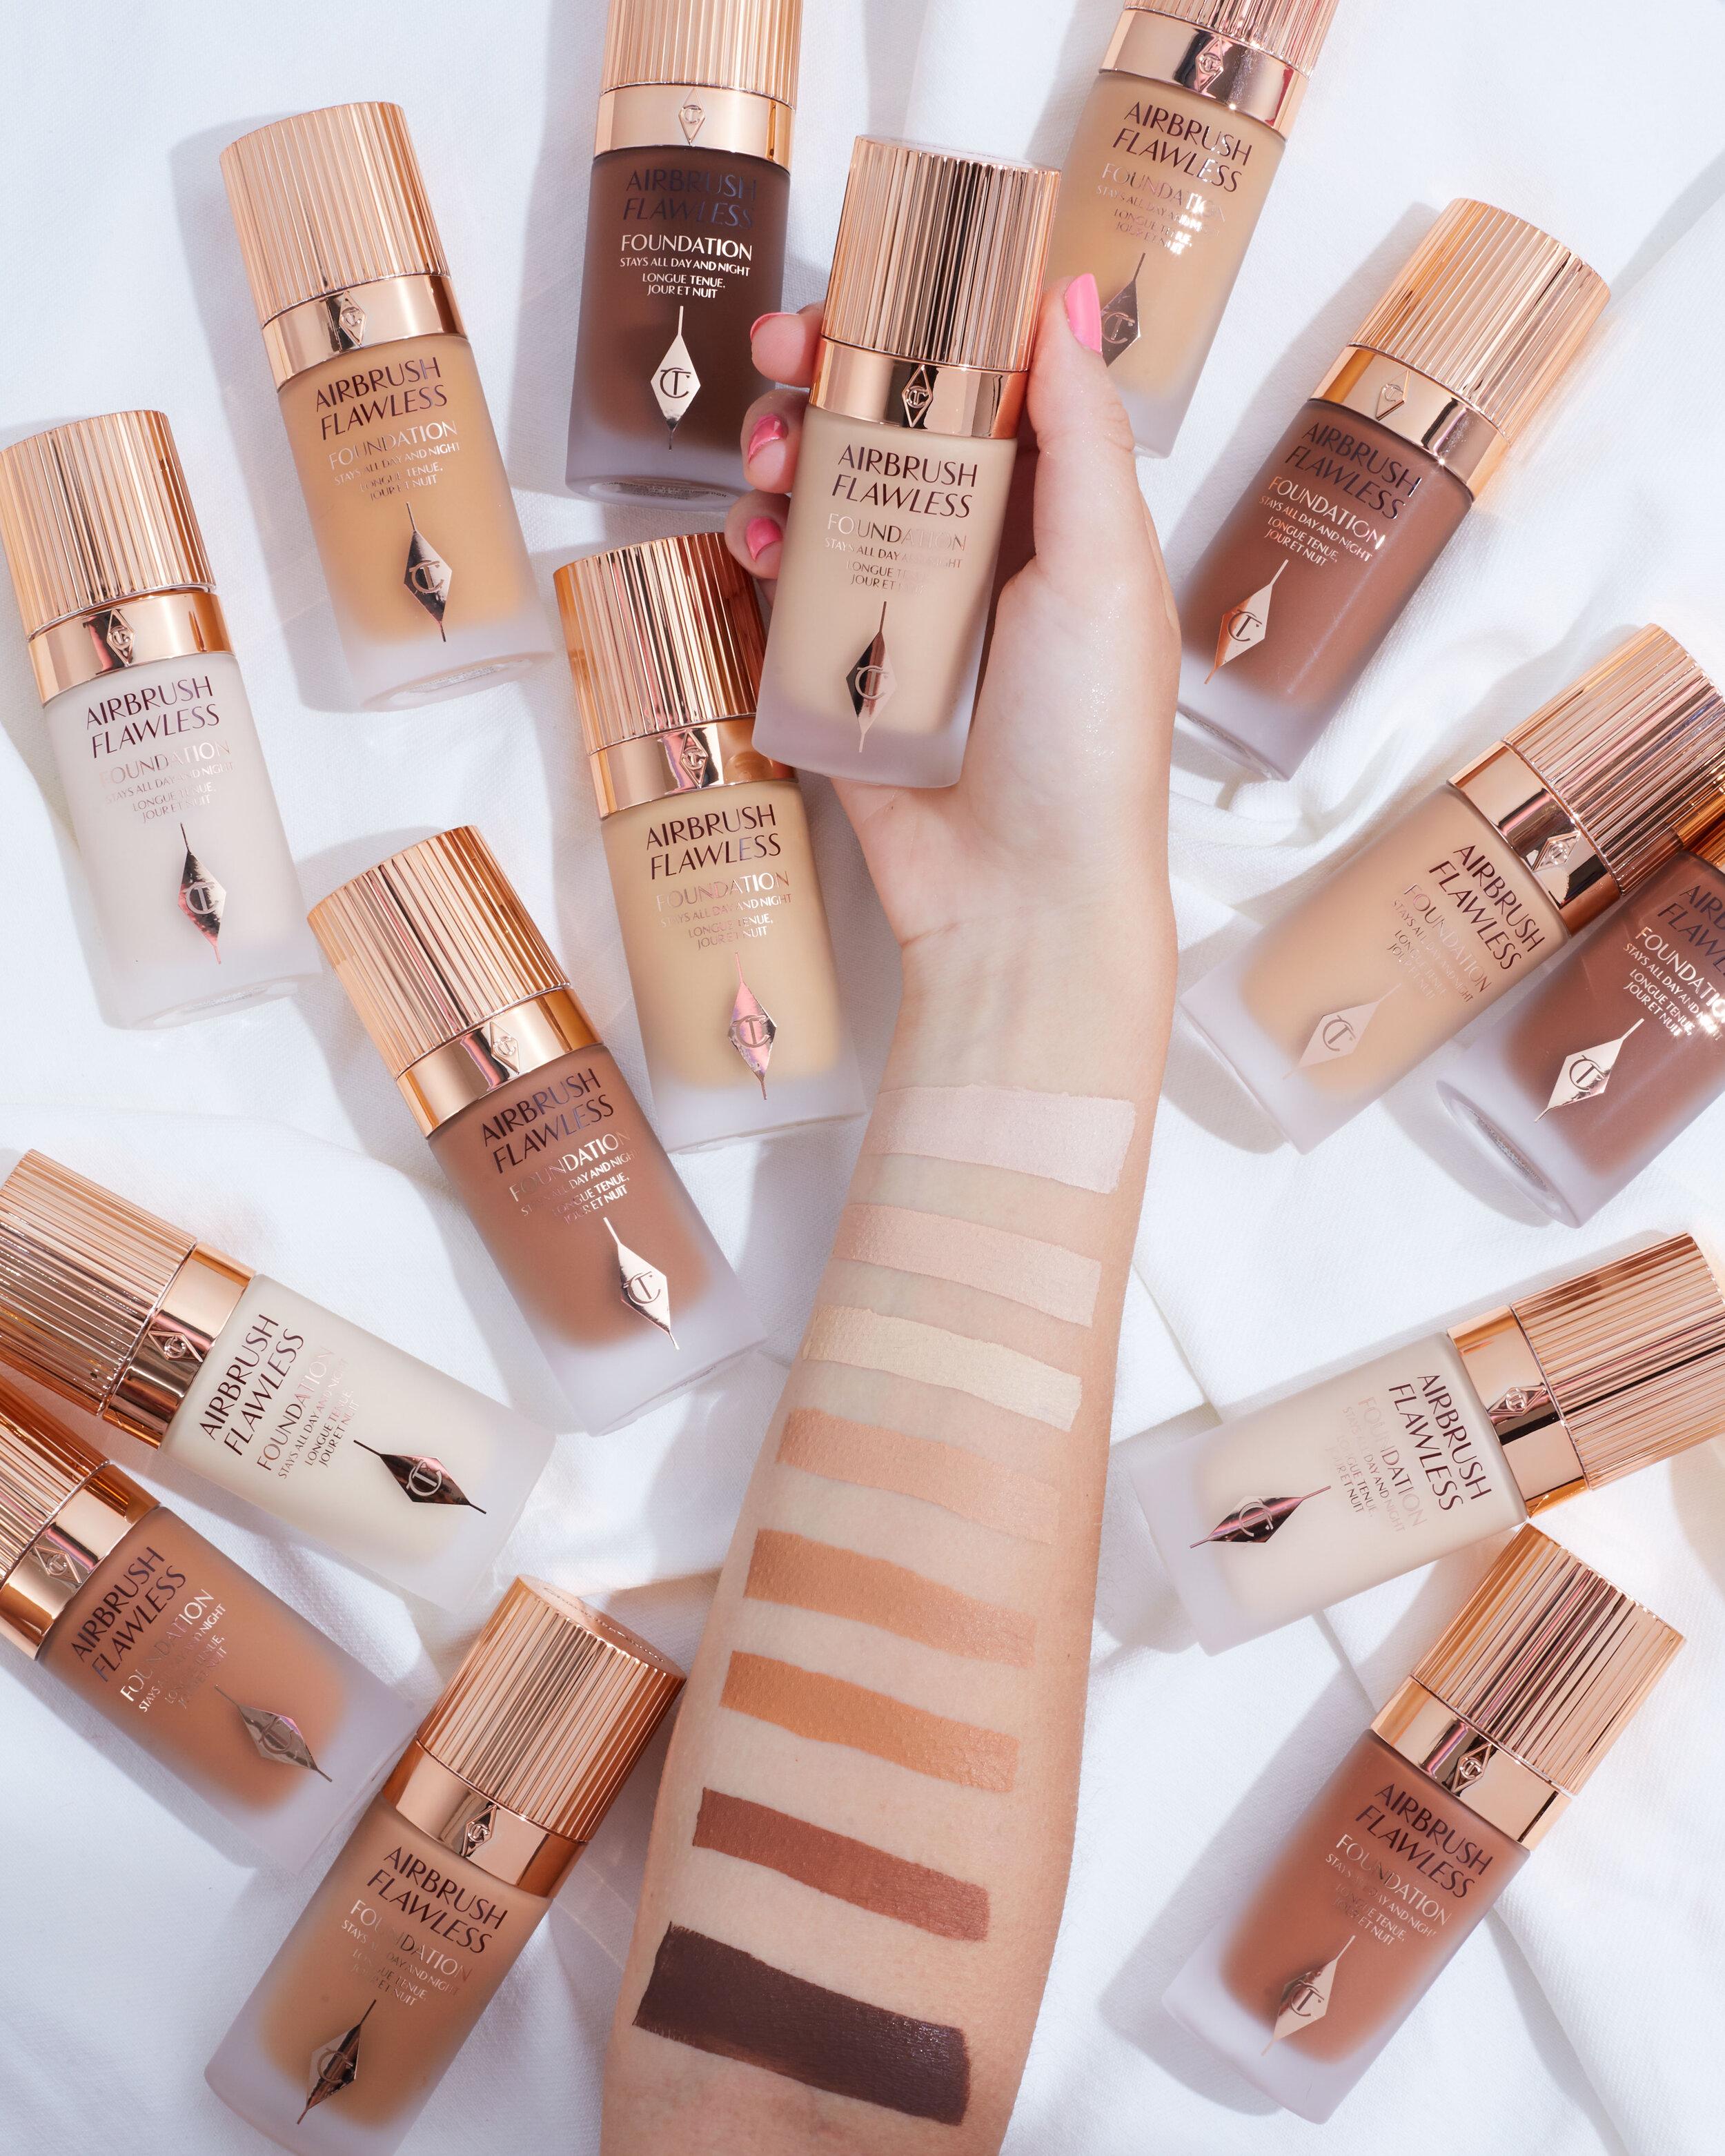 charlotte tilbury makeup - and Influenster